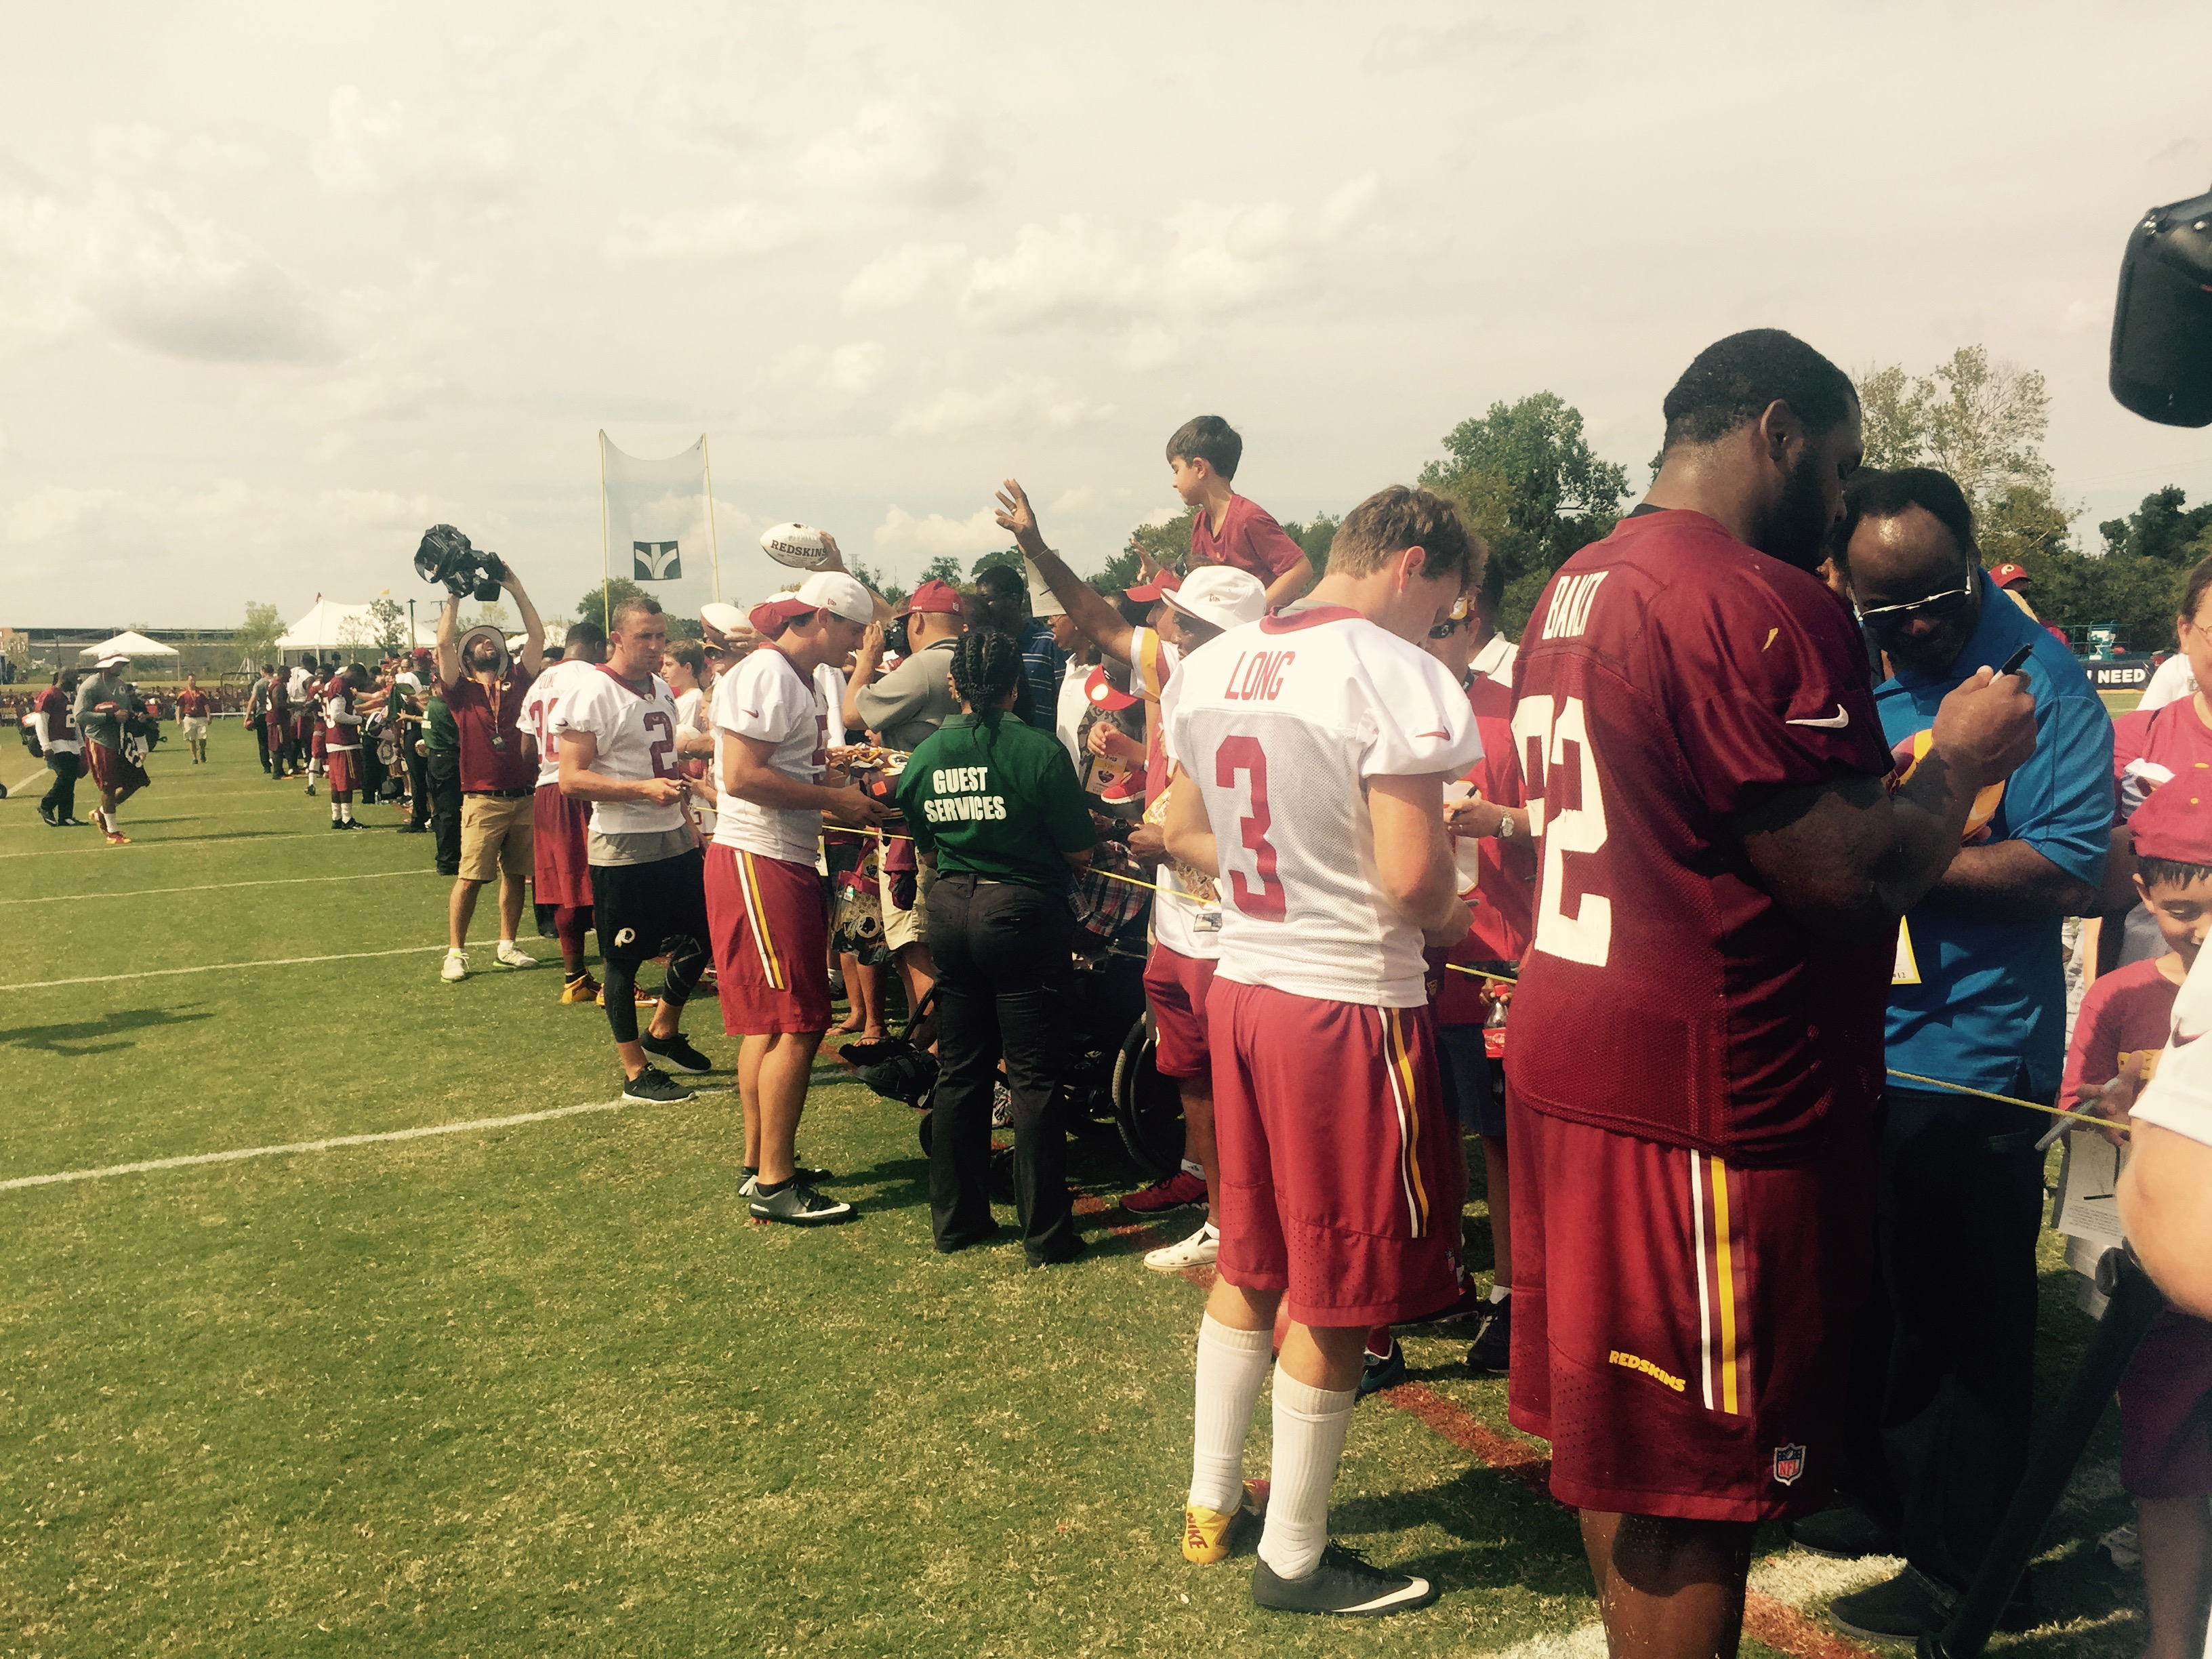 The scene at Redskins fan appreciation day